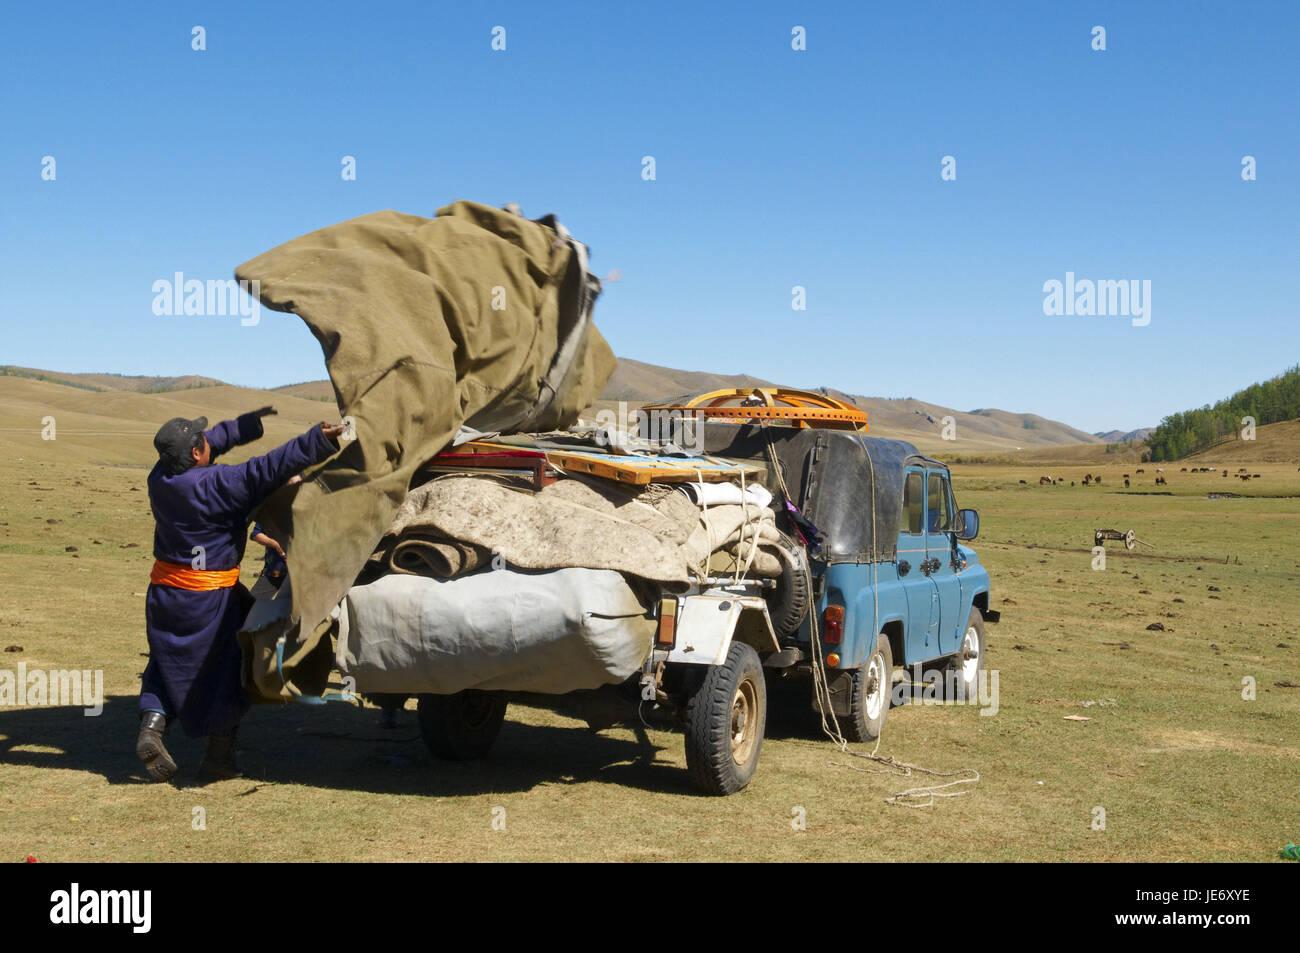 Mongolia, Central Asia, Arkhangai province, nomad, support, Jurte break down, vehicle charge, - Stock Image